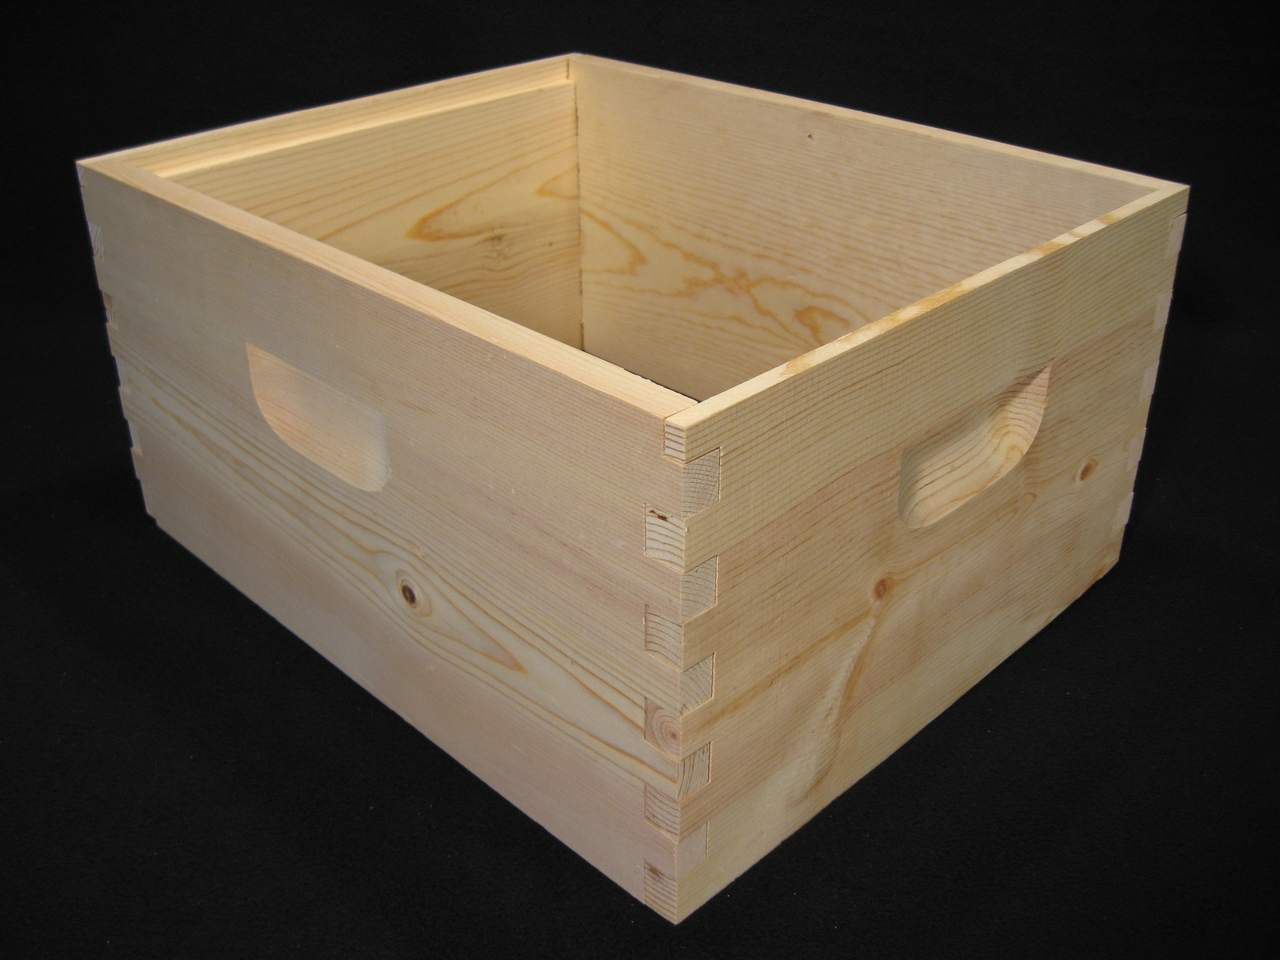 beekeeping equipment u0026 supplies for sale lappe u0027s bee supply llc